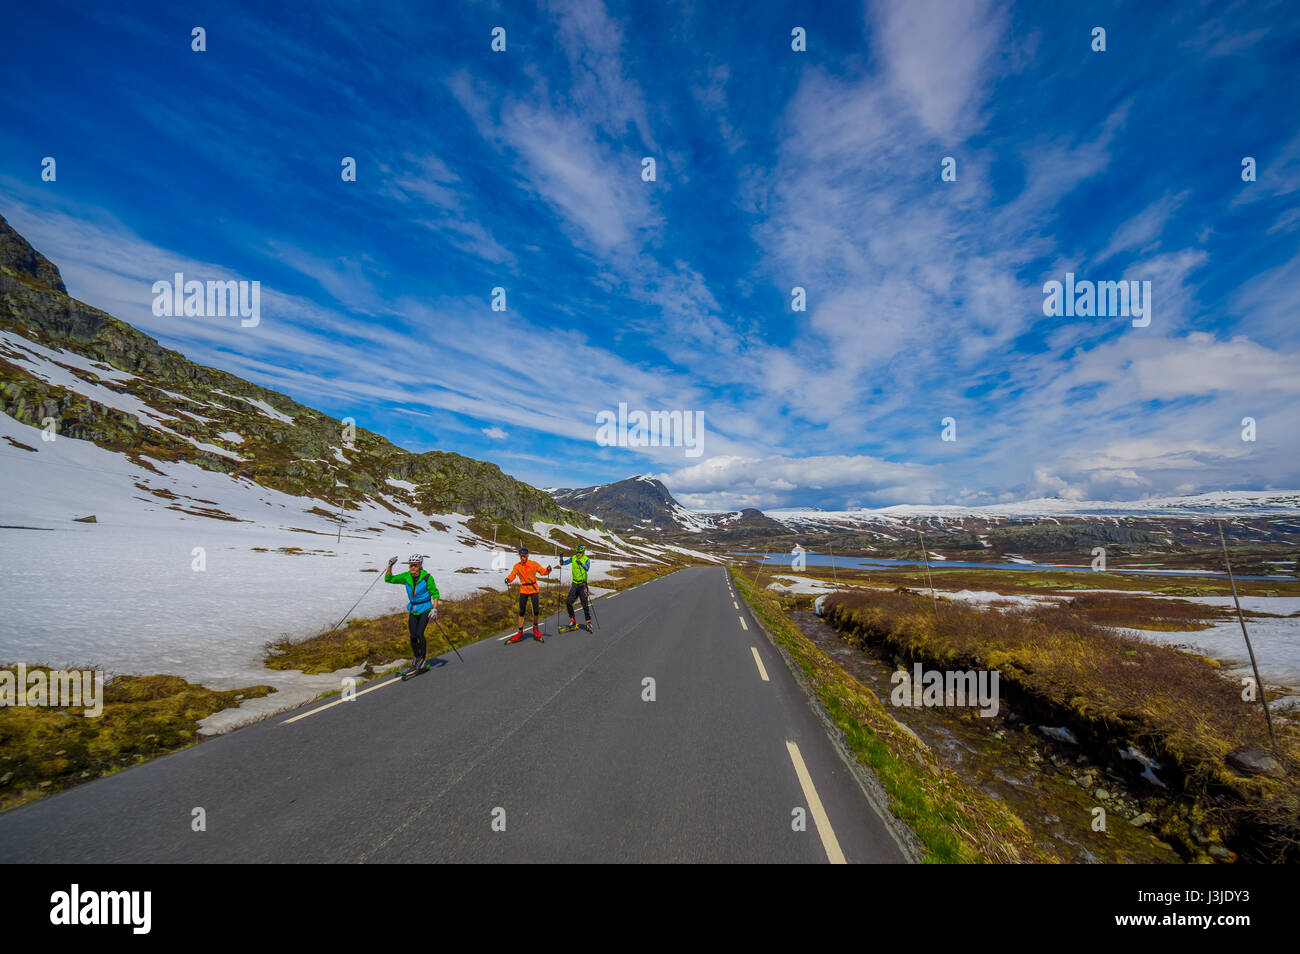 VALDRES, NORWAY - 6 JULY, 2015: Beautiful road passing through Valdresflya mountain range sorrounded by stunning - Stock Image